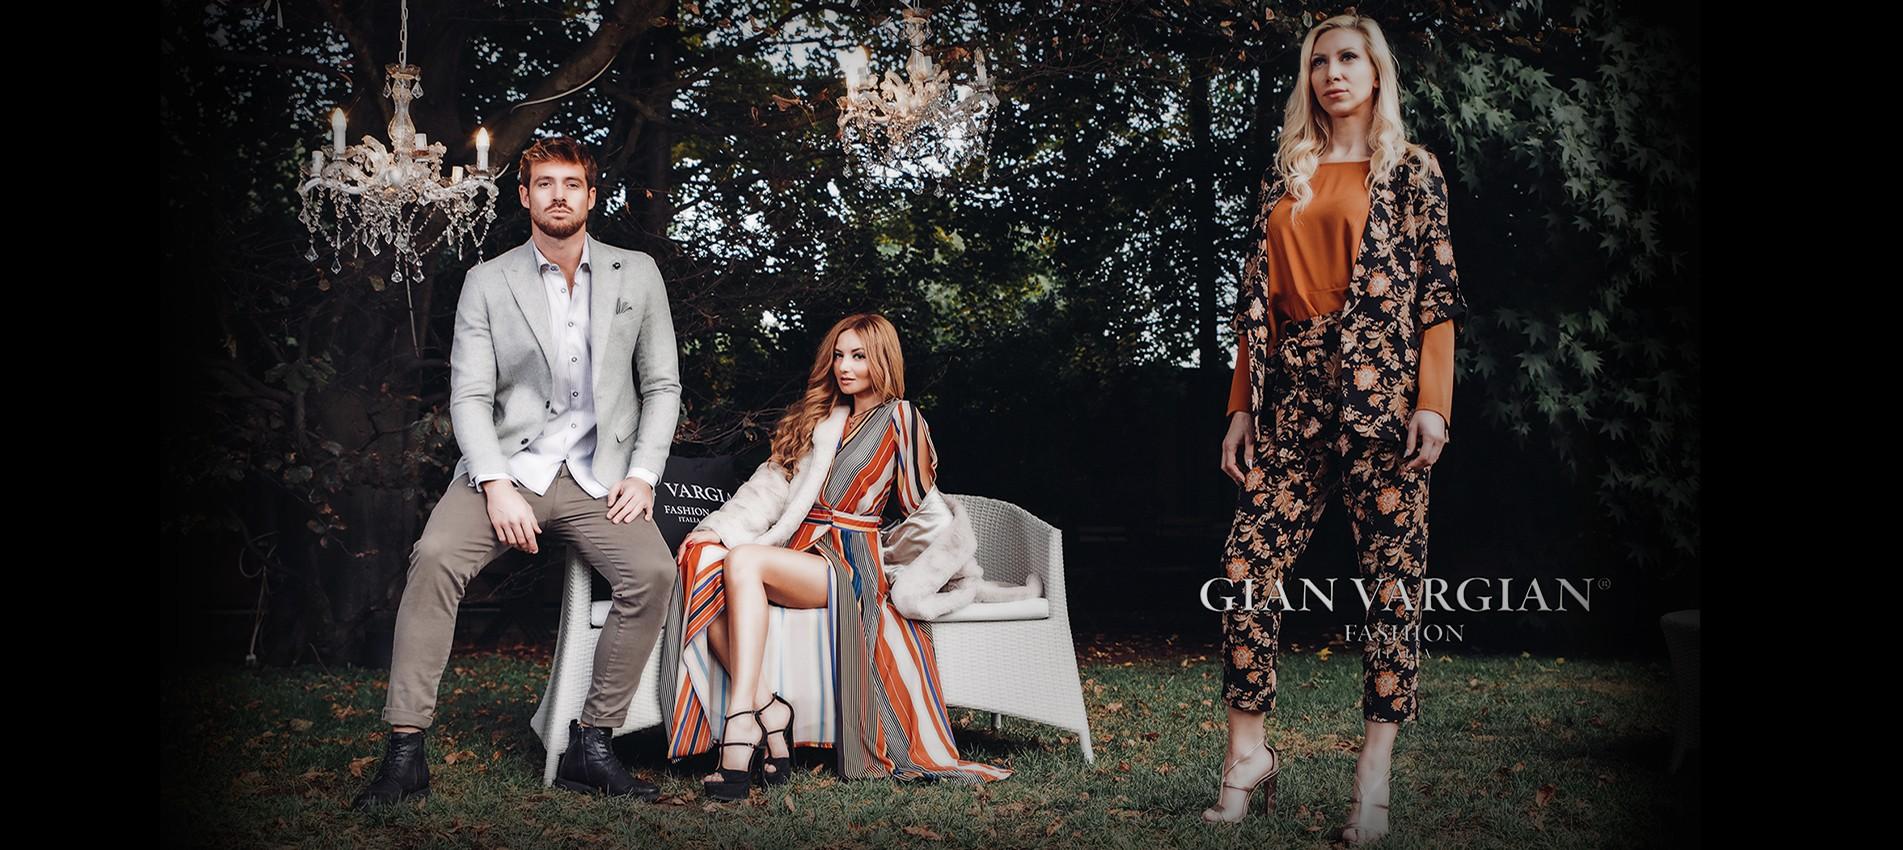 6a0c48662b6d Negozio online abbigliamento uomo donna fashion - Gian Vargian ...